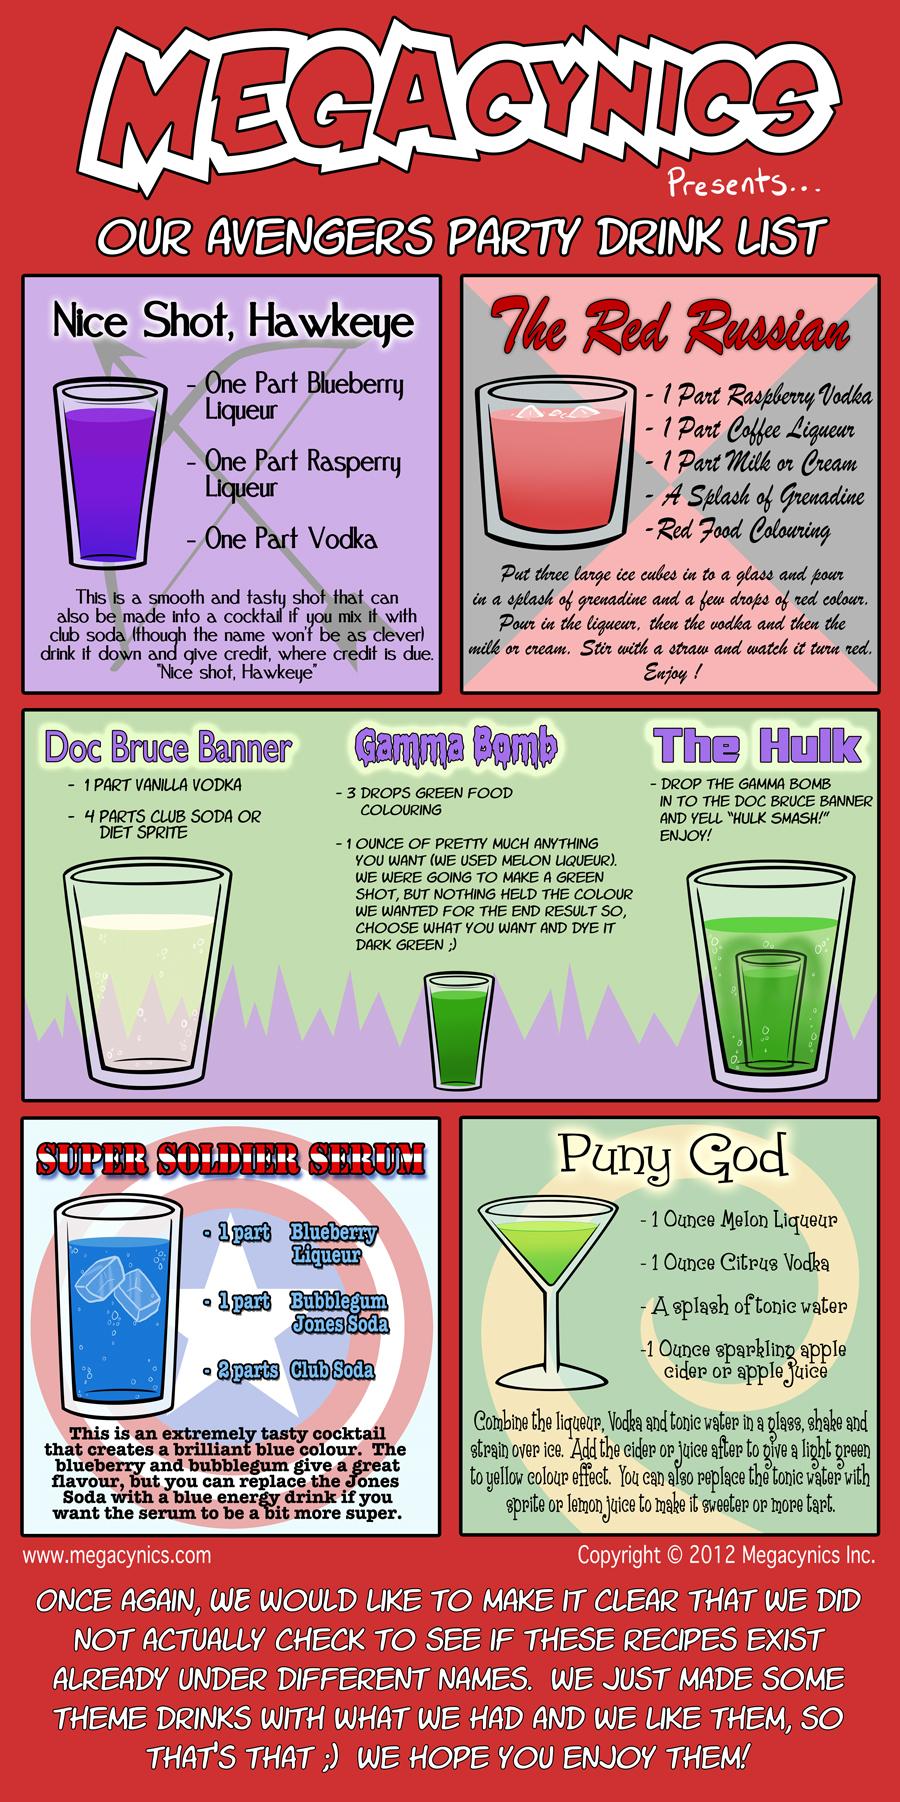 The Avengers Drink List